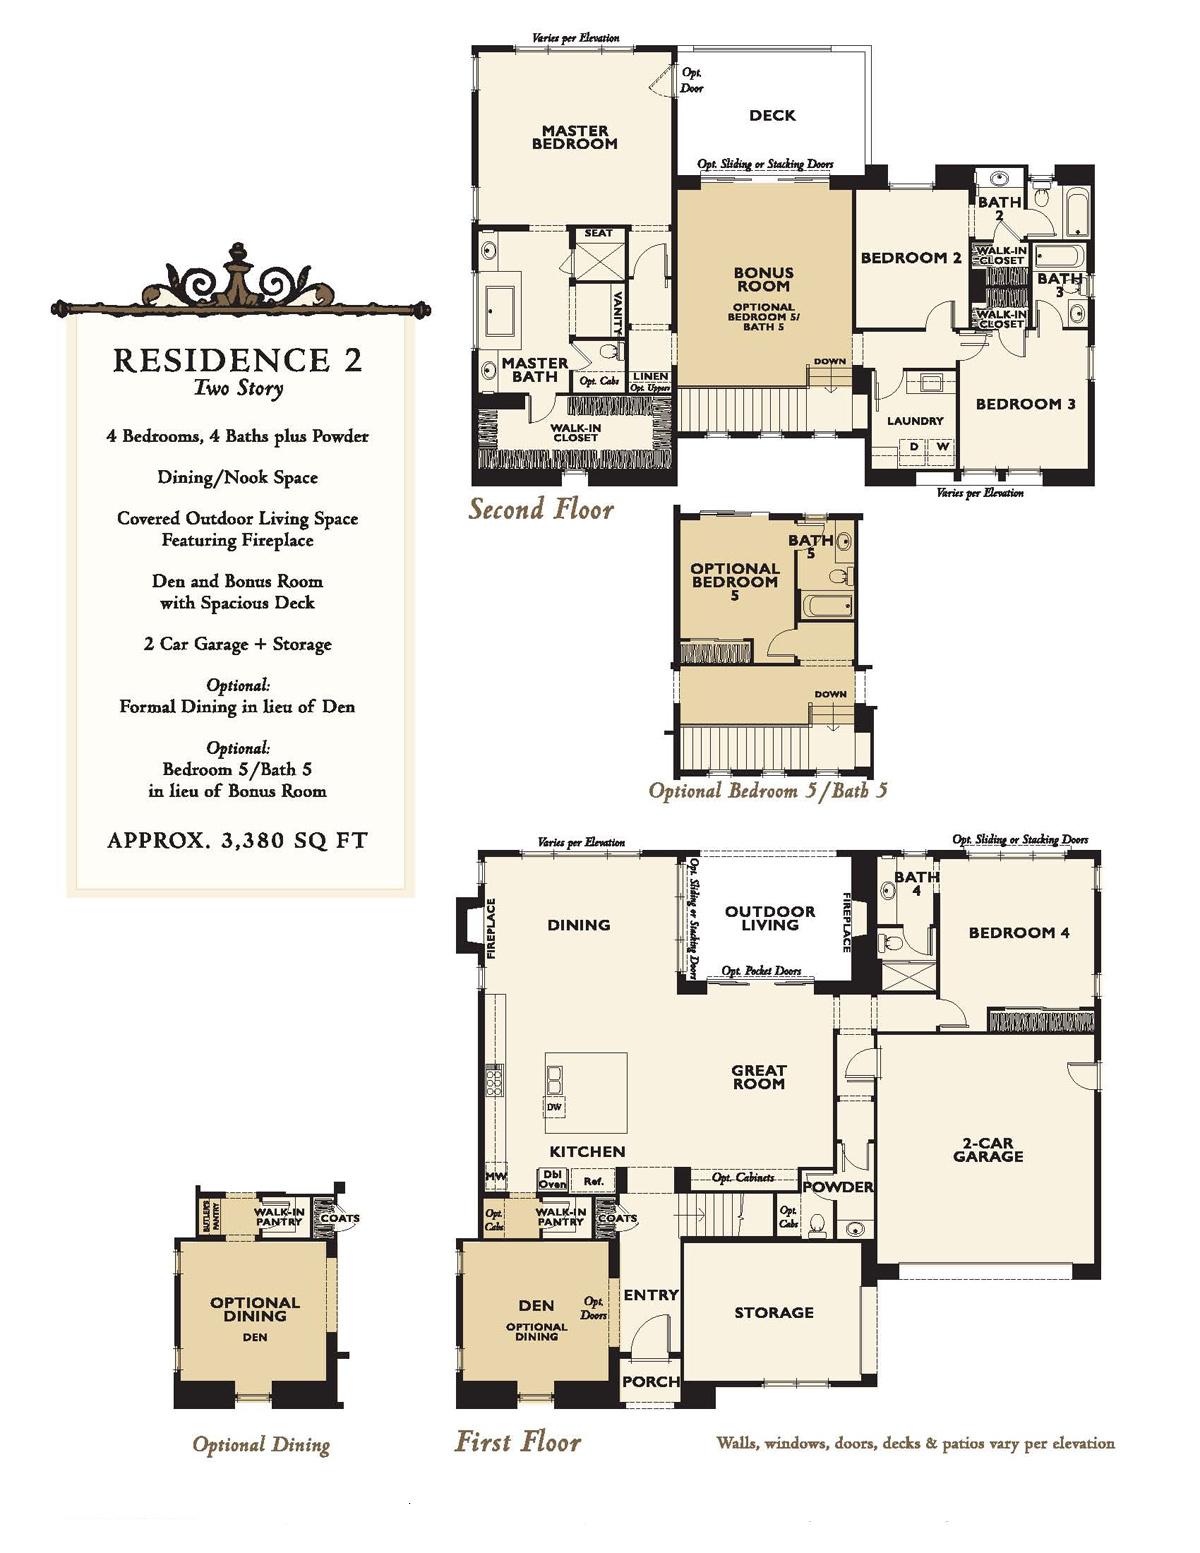 New Homes At Enclave Rancho Santa Fe Floor Plans North County New Homes